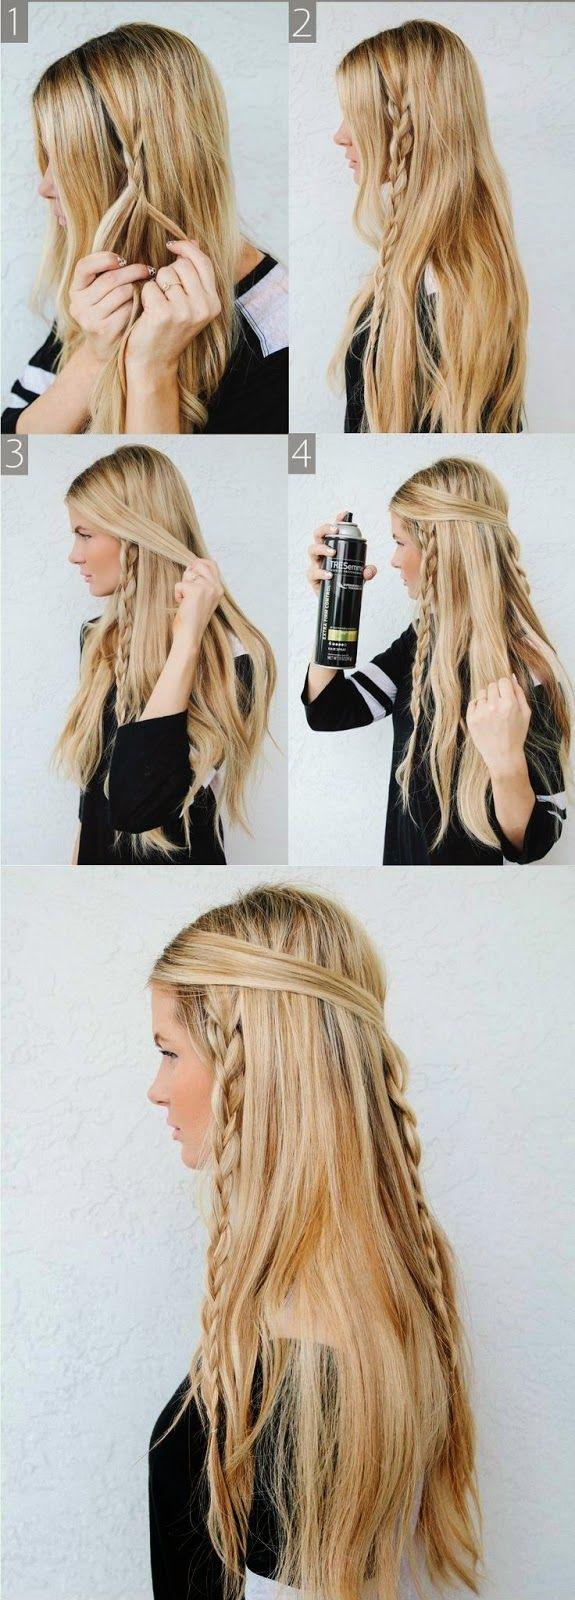 Best Braid for Long Hair Easy braided hairstyles Hippie braids